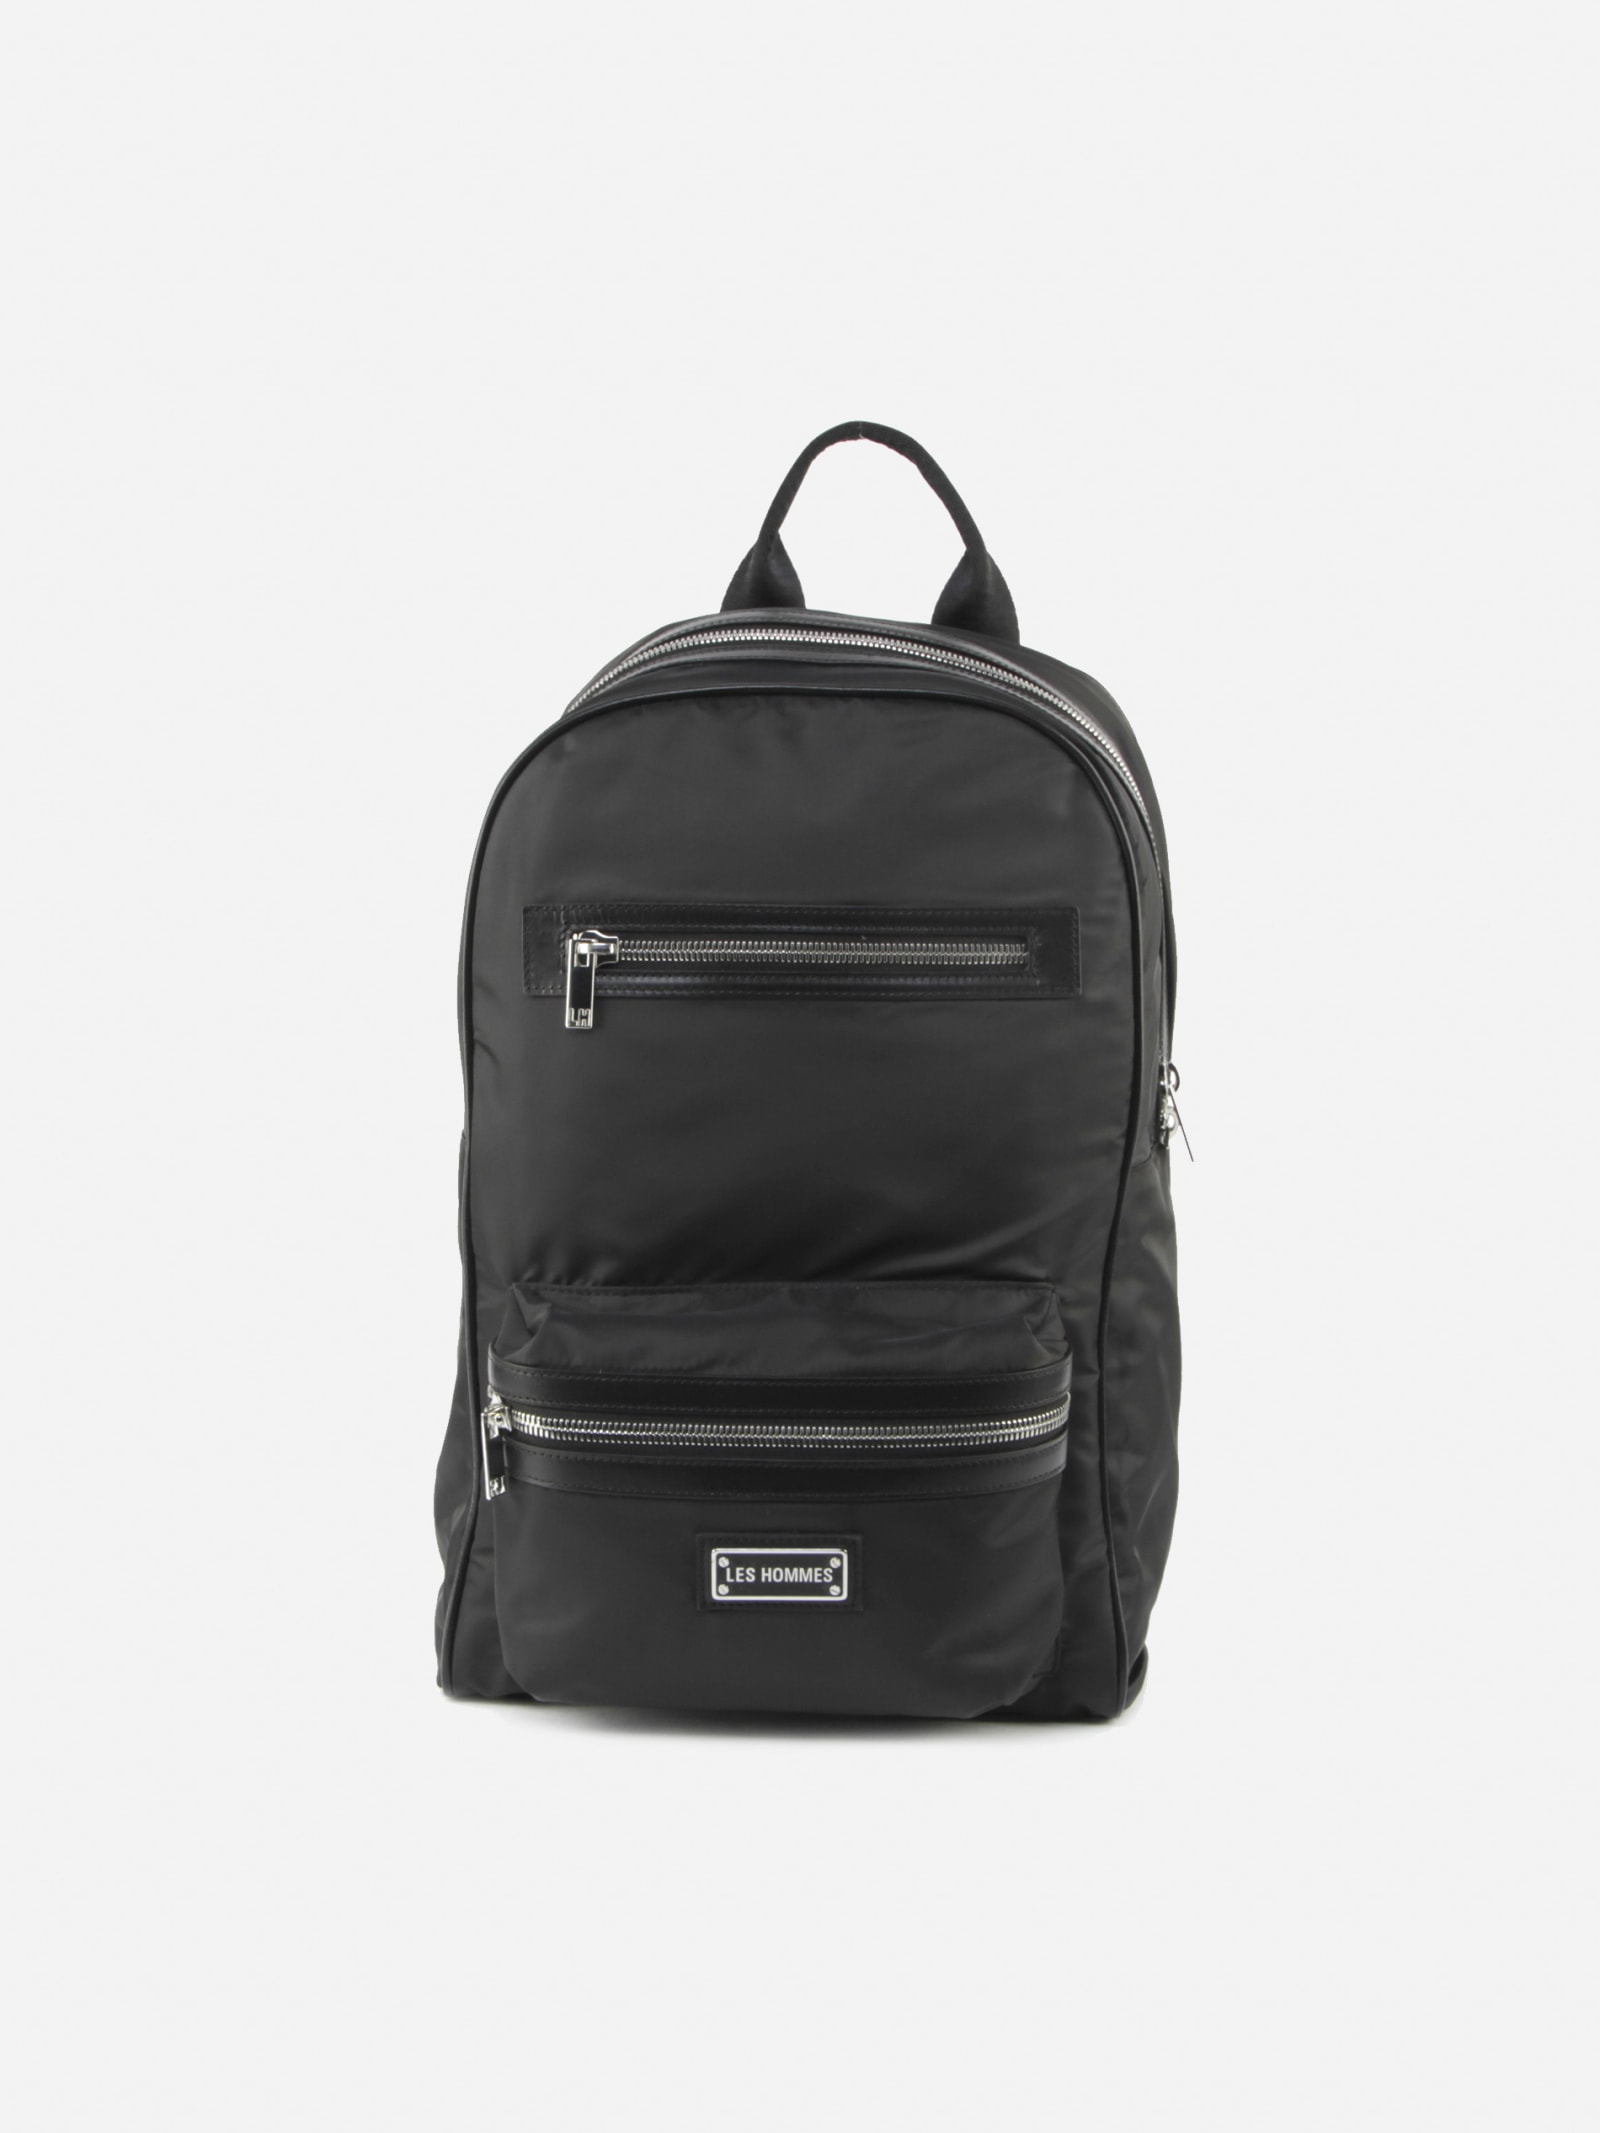 Les Hommes Backpacks NYLON BACKPACK WITH METAL LOGO DETAIL